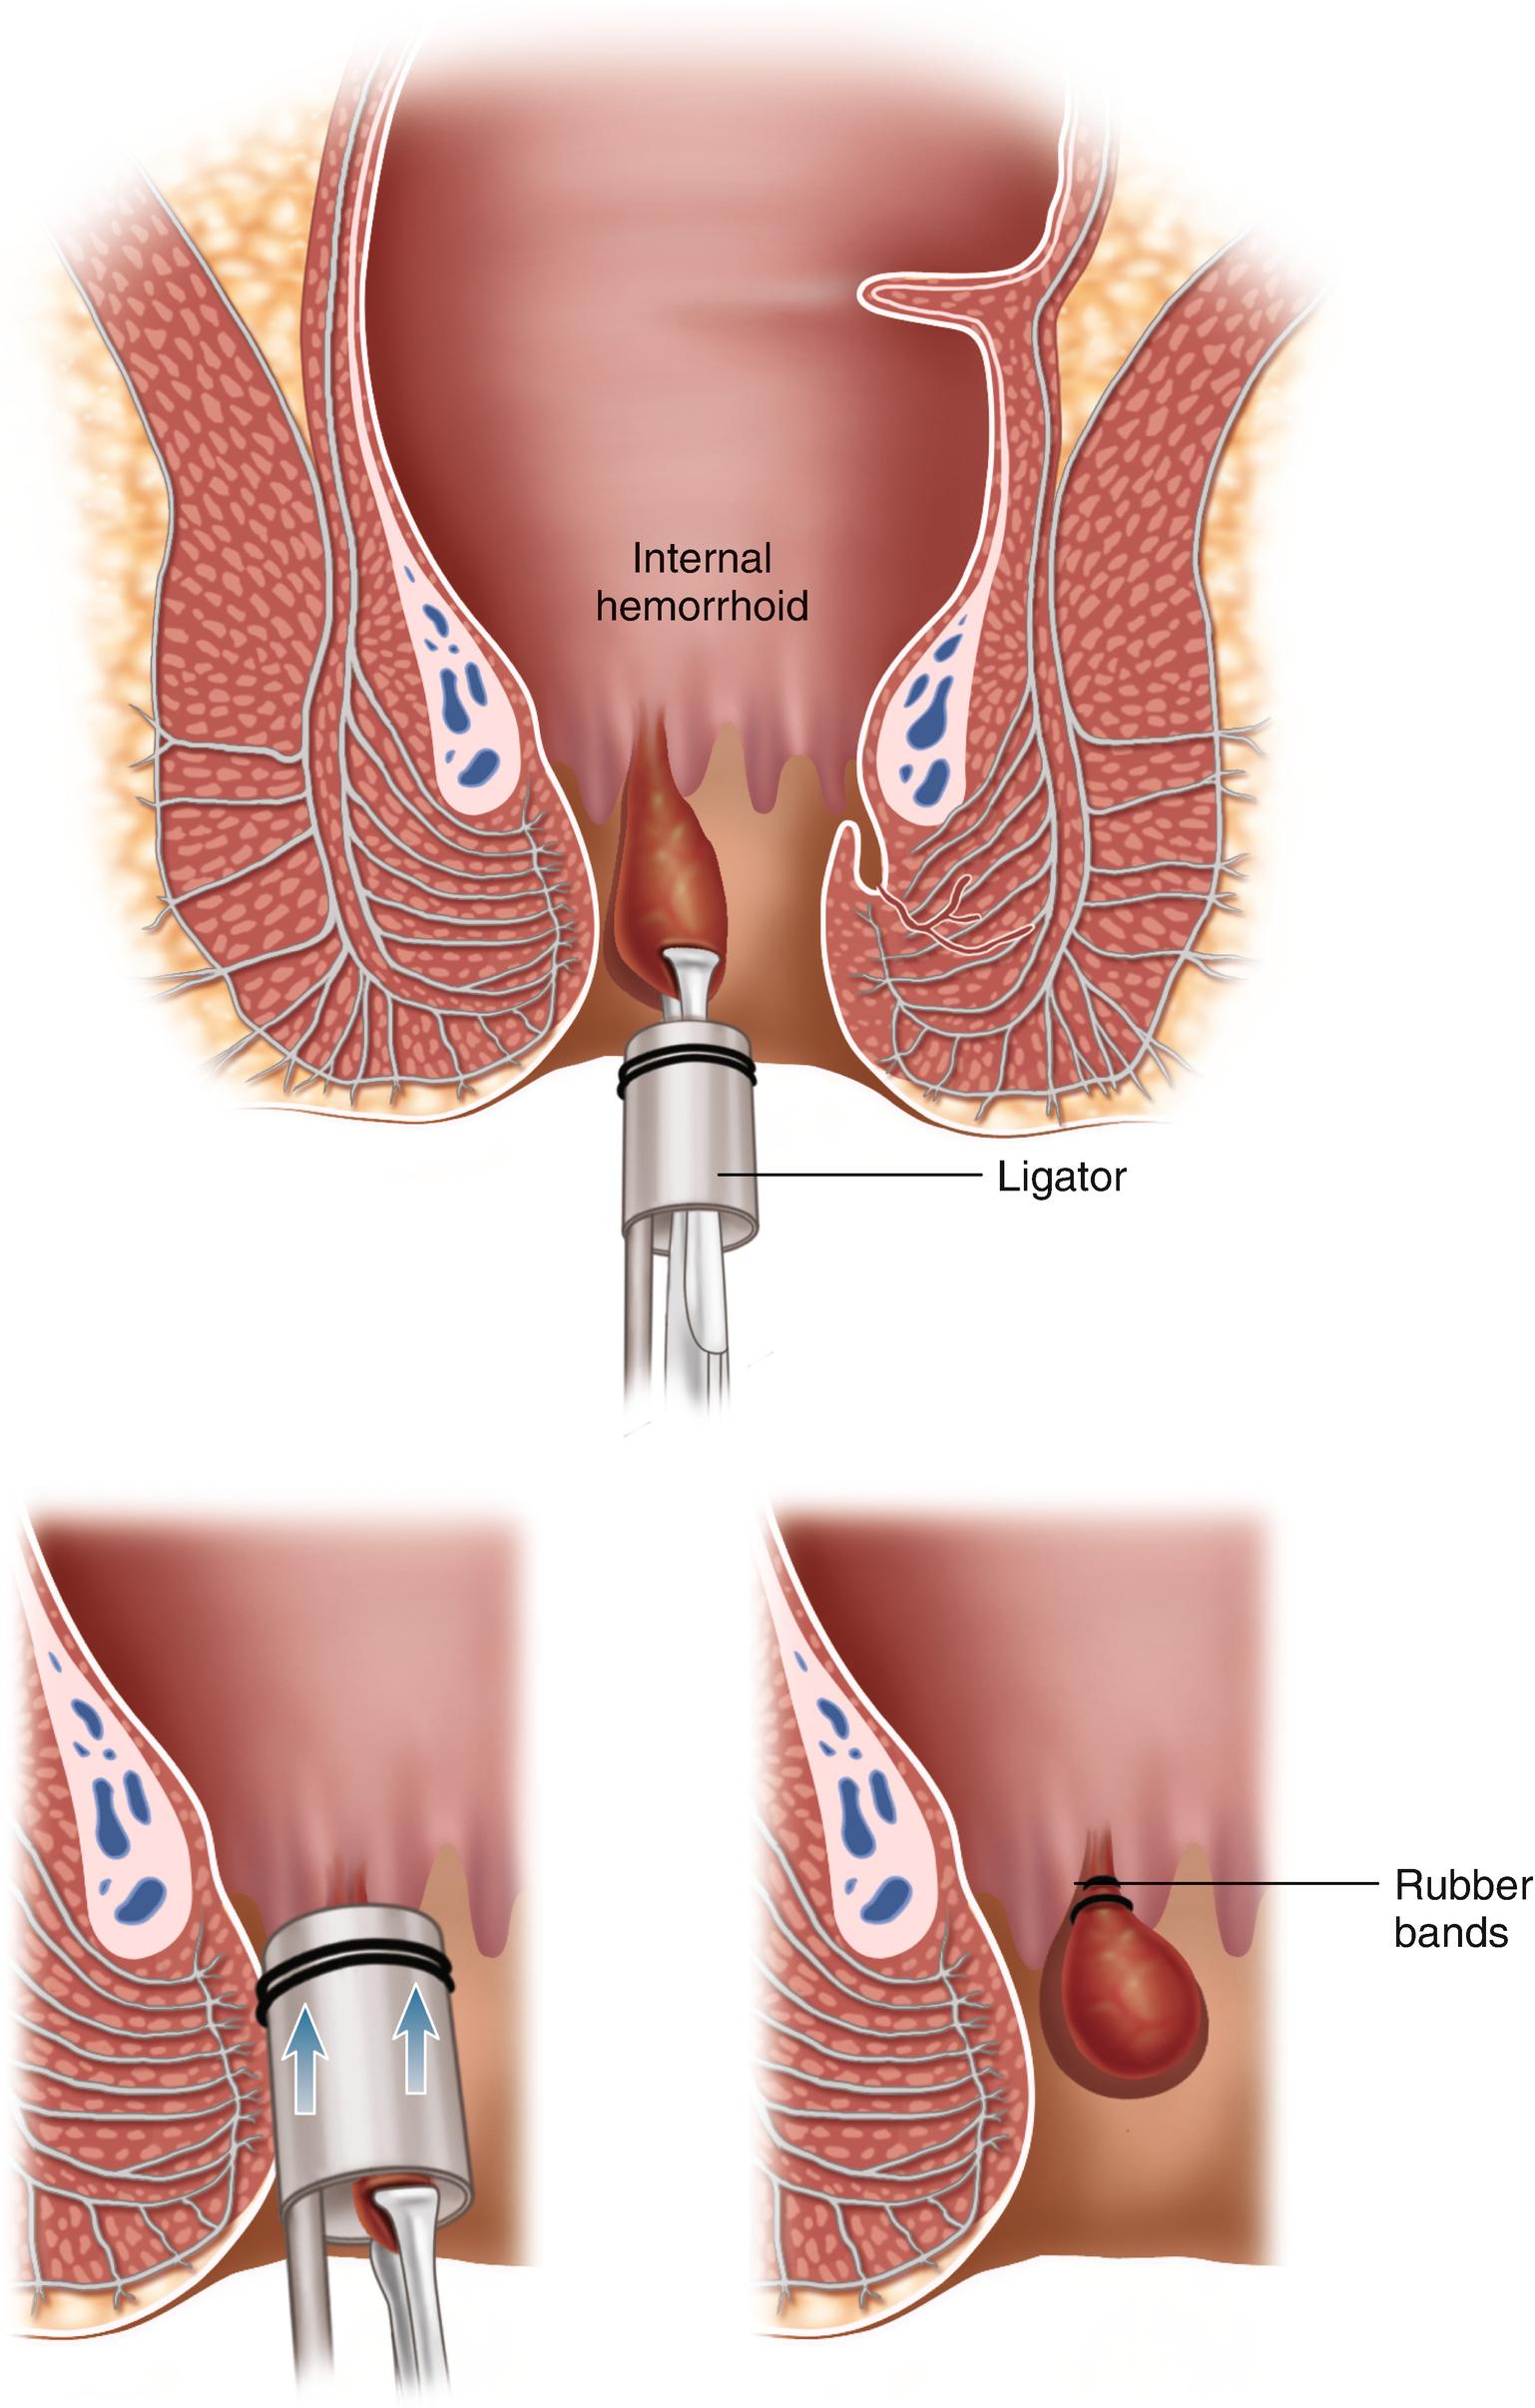 Hemorrhoids Springerlink